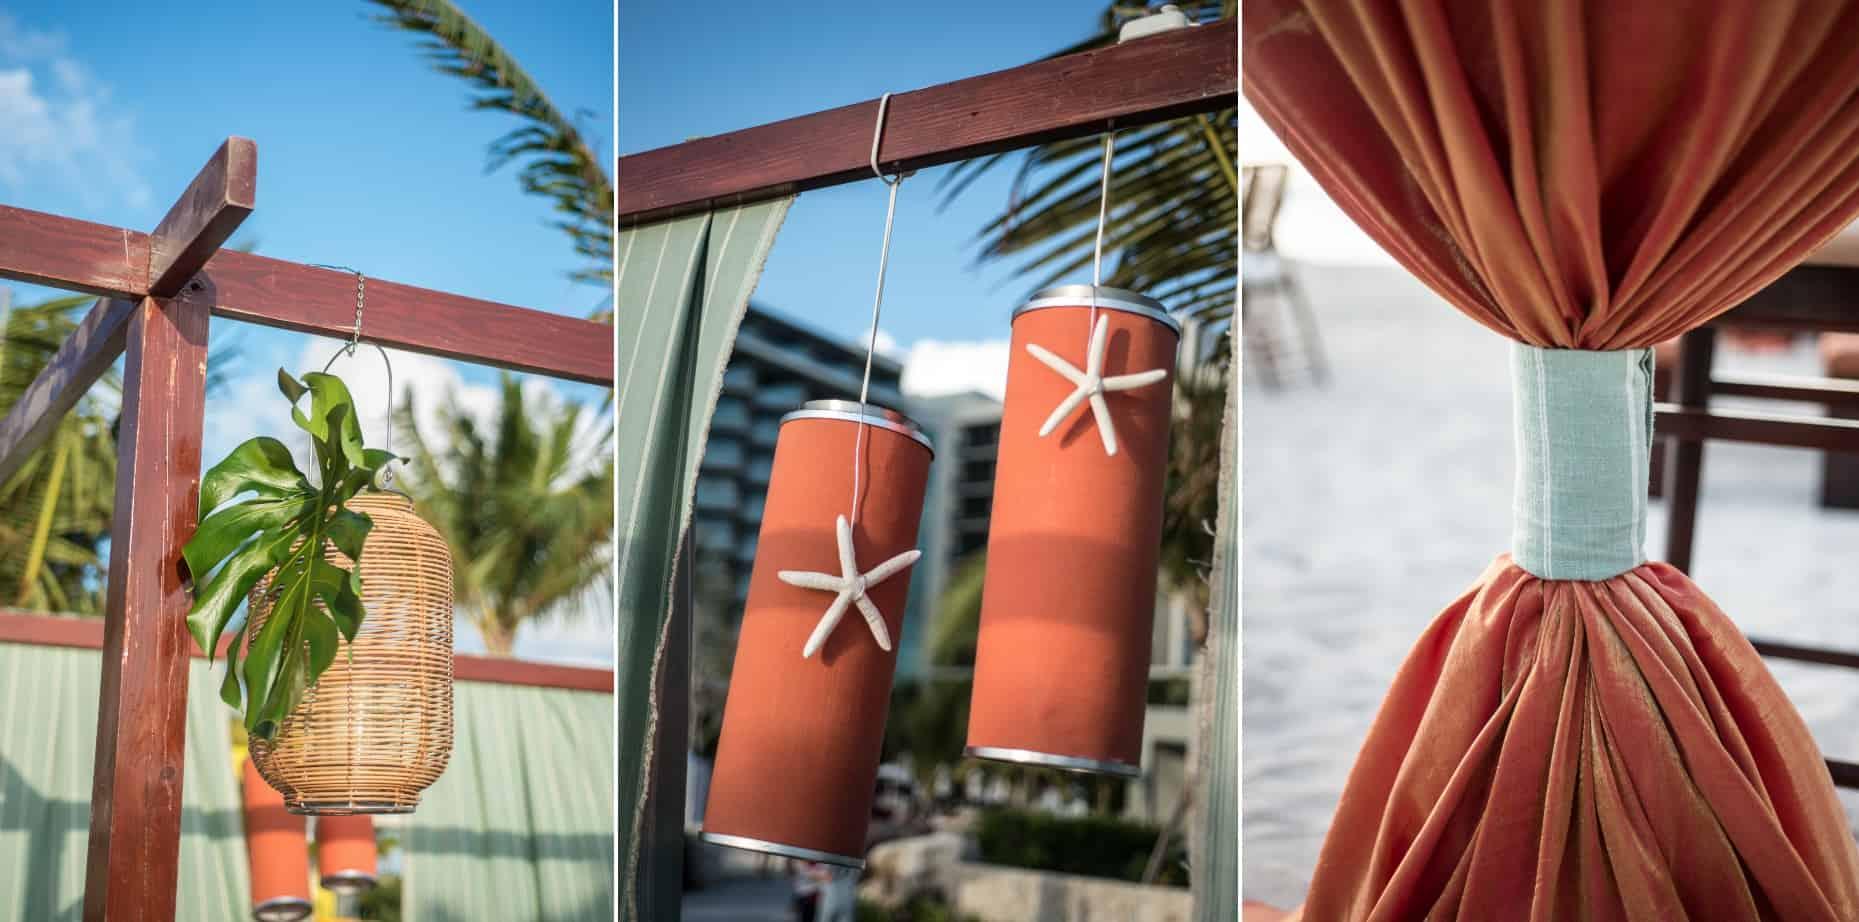 lanterns-details-cayman-islands-beach-reception-corporate-event-by-celebrations-ltd